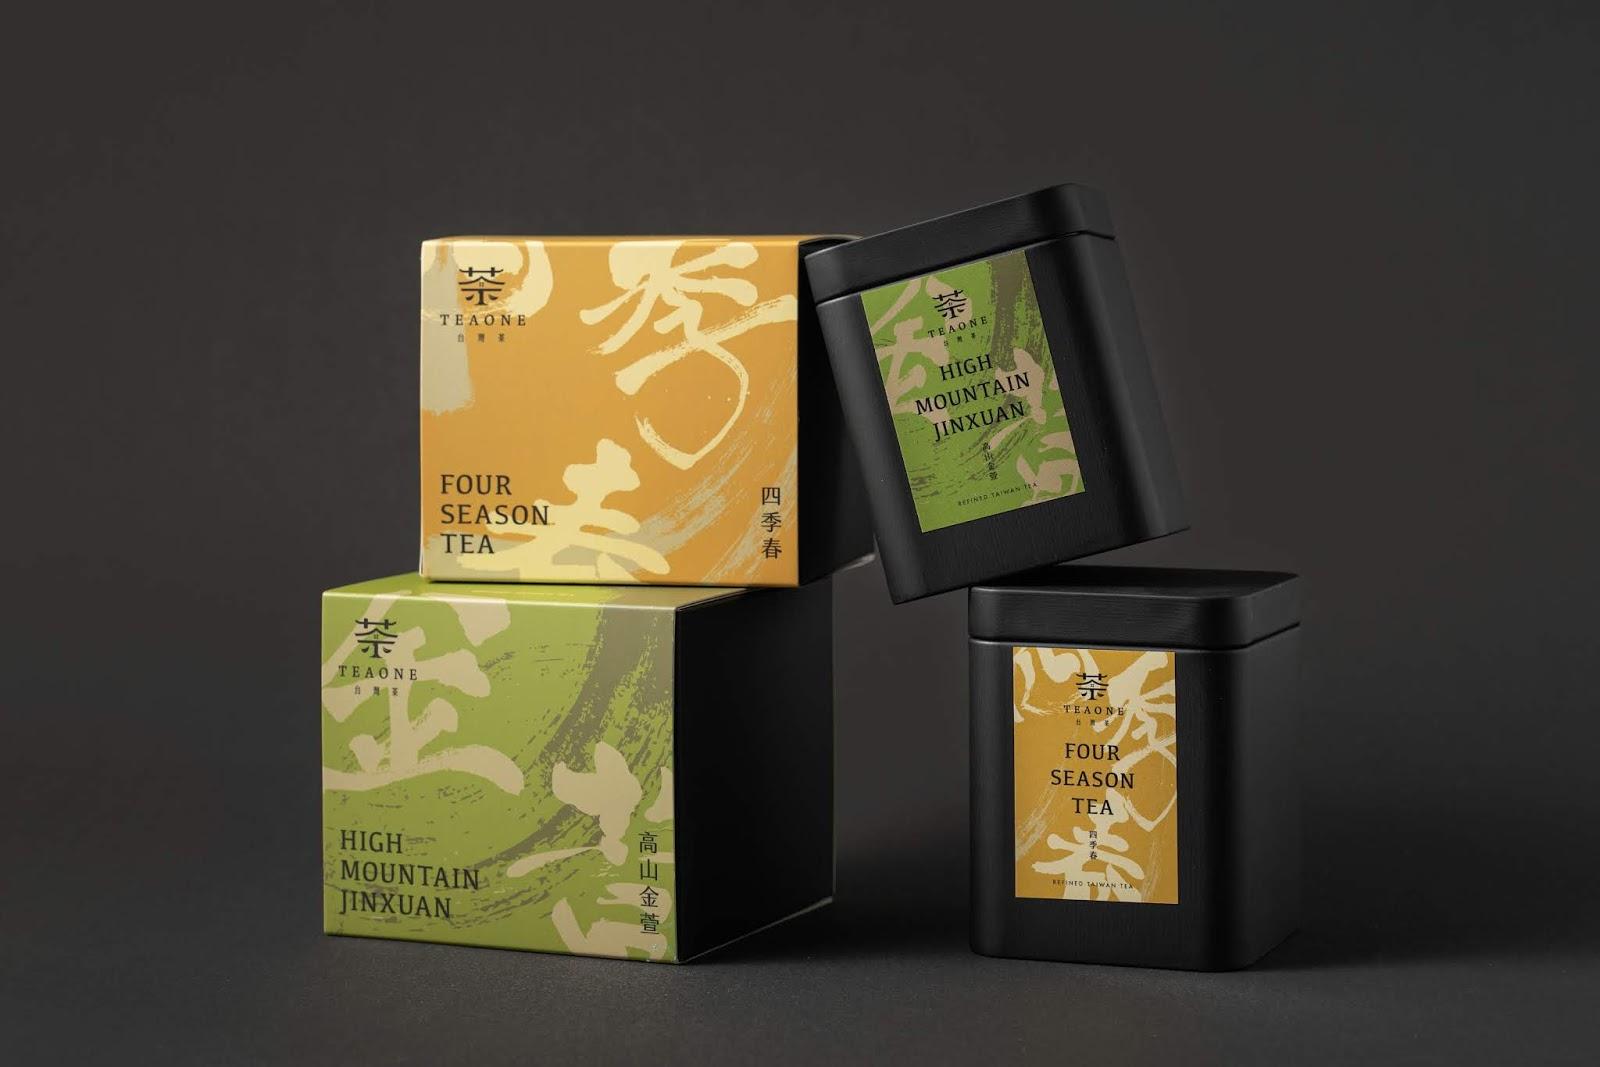 TEAONE 茶包礼盒4